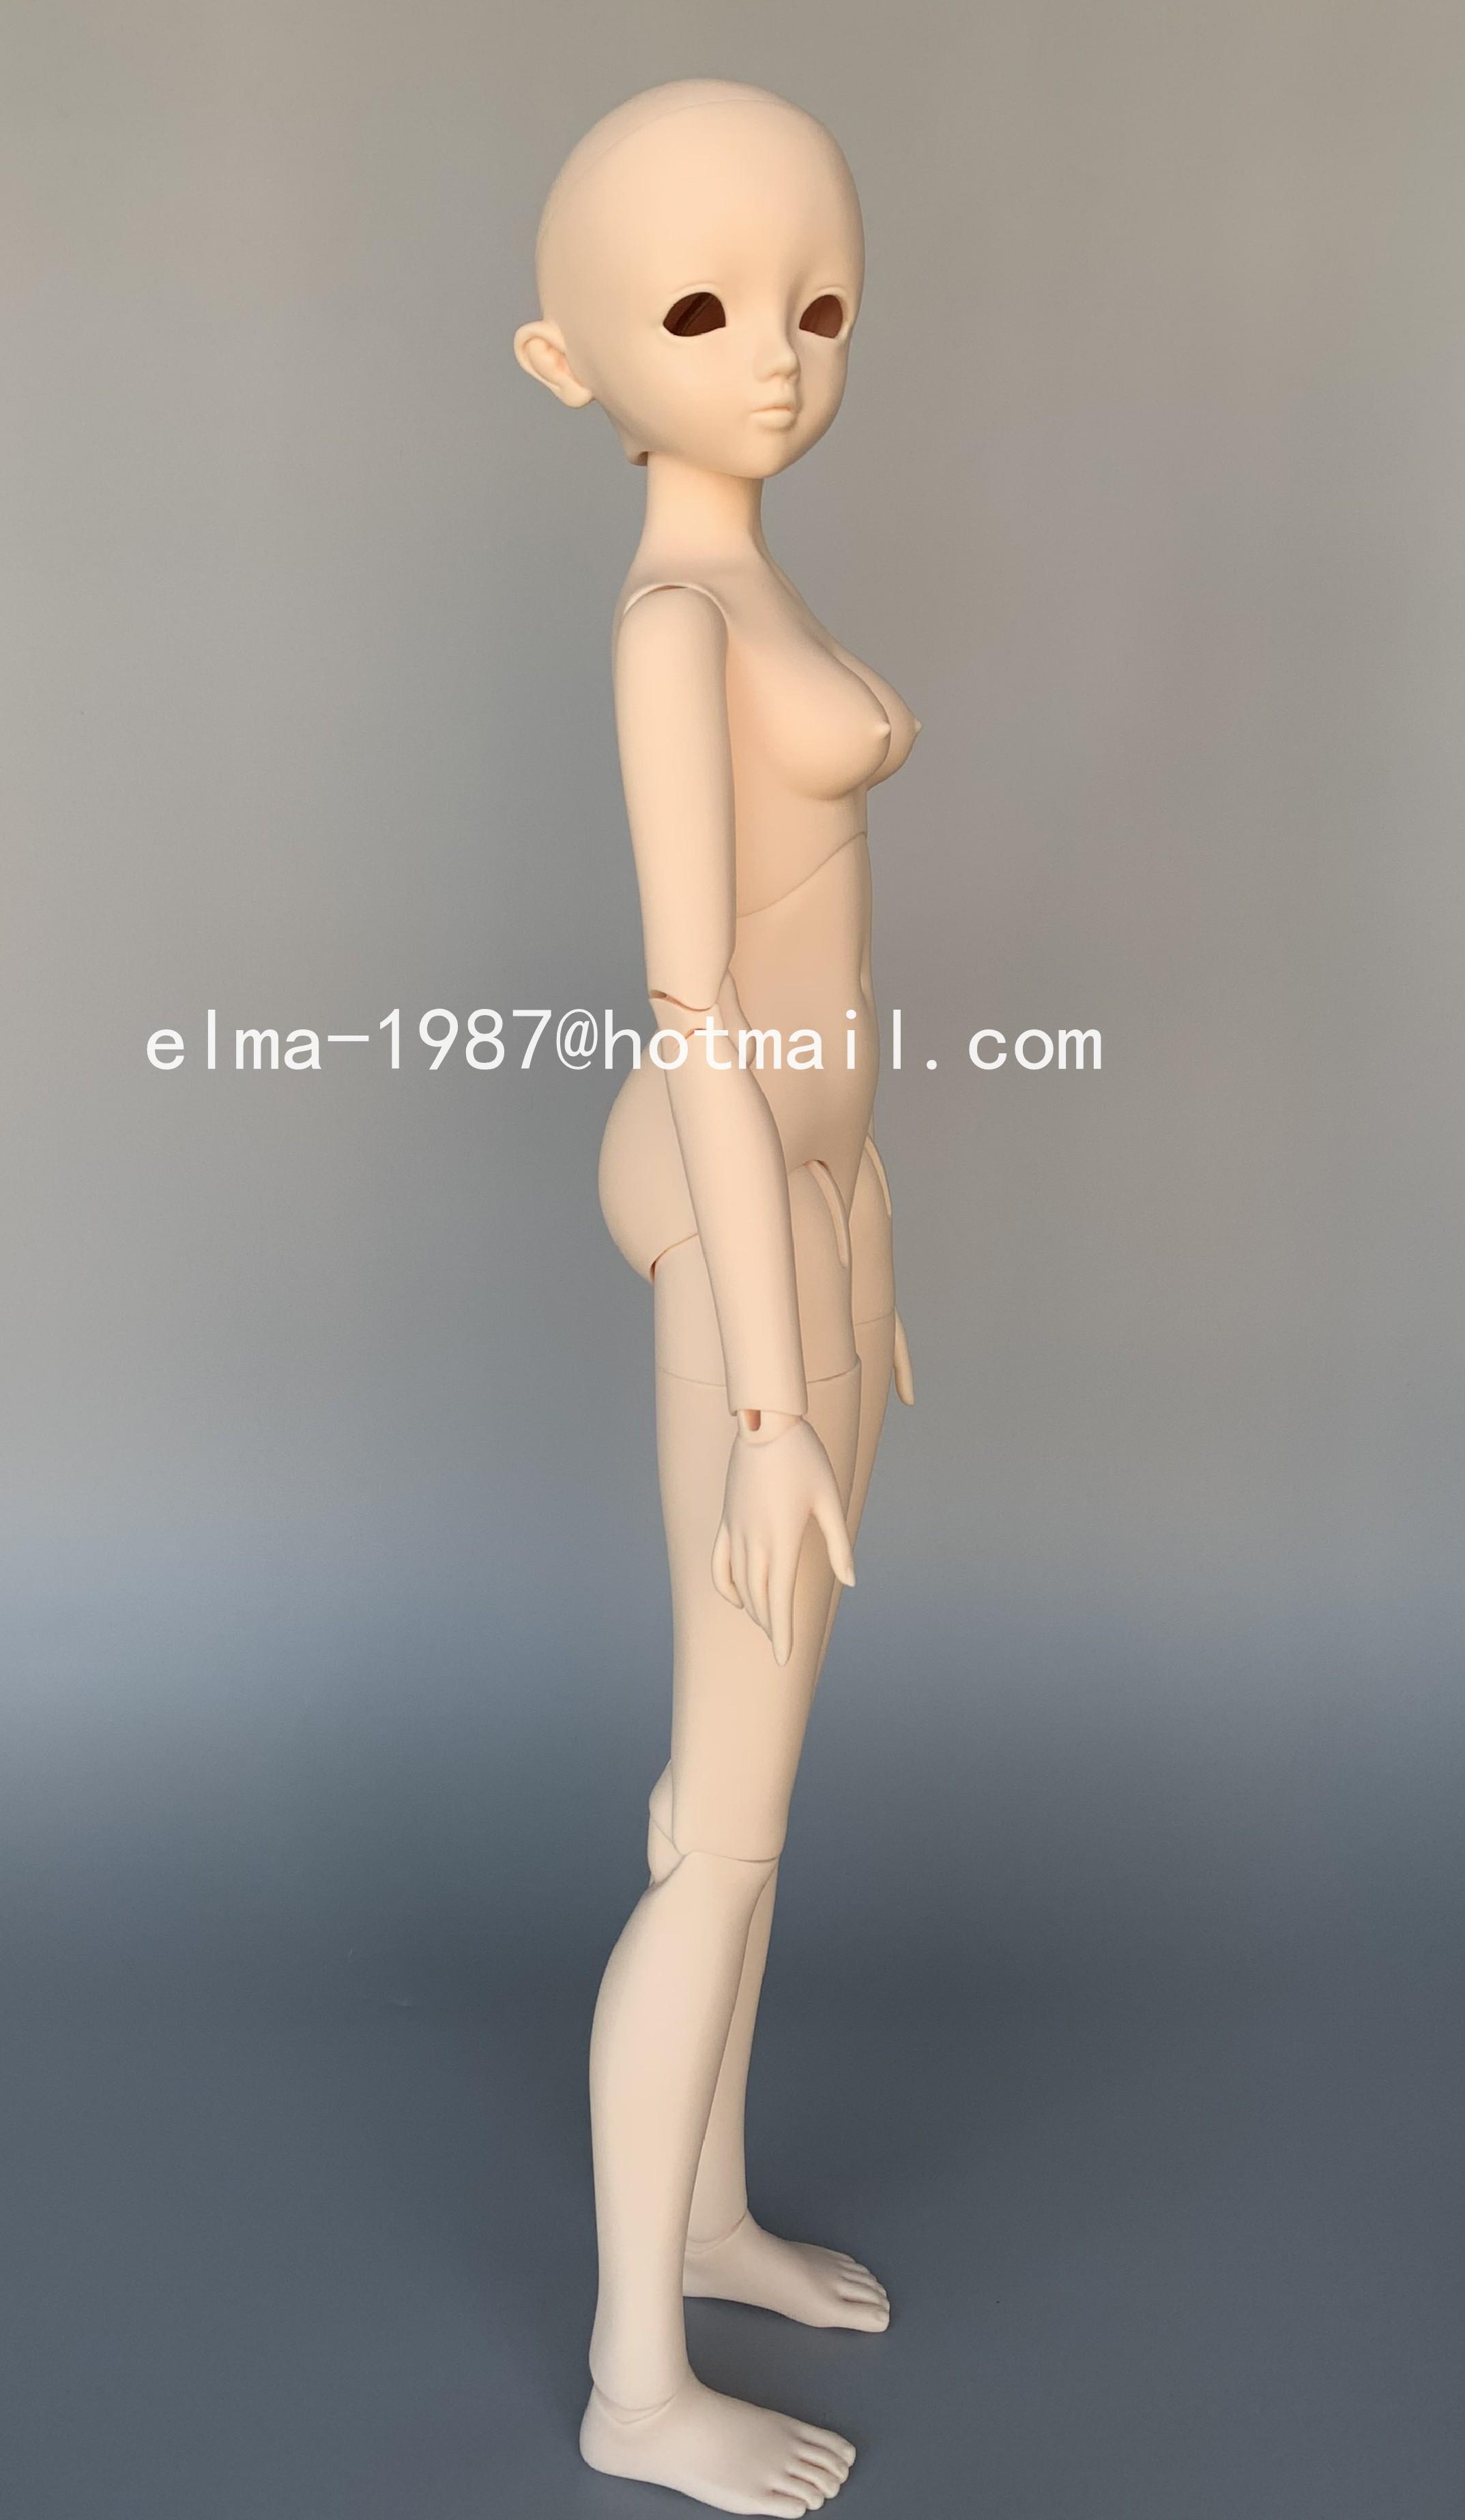 ae-girl-body-volks-charlotte_3.jpg